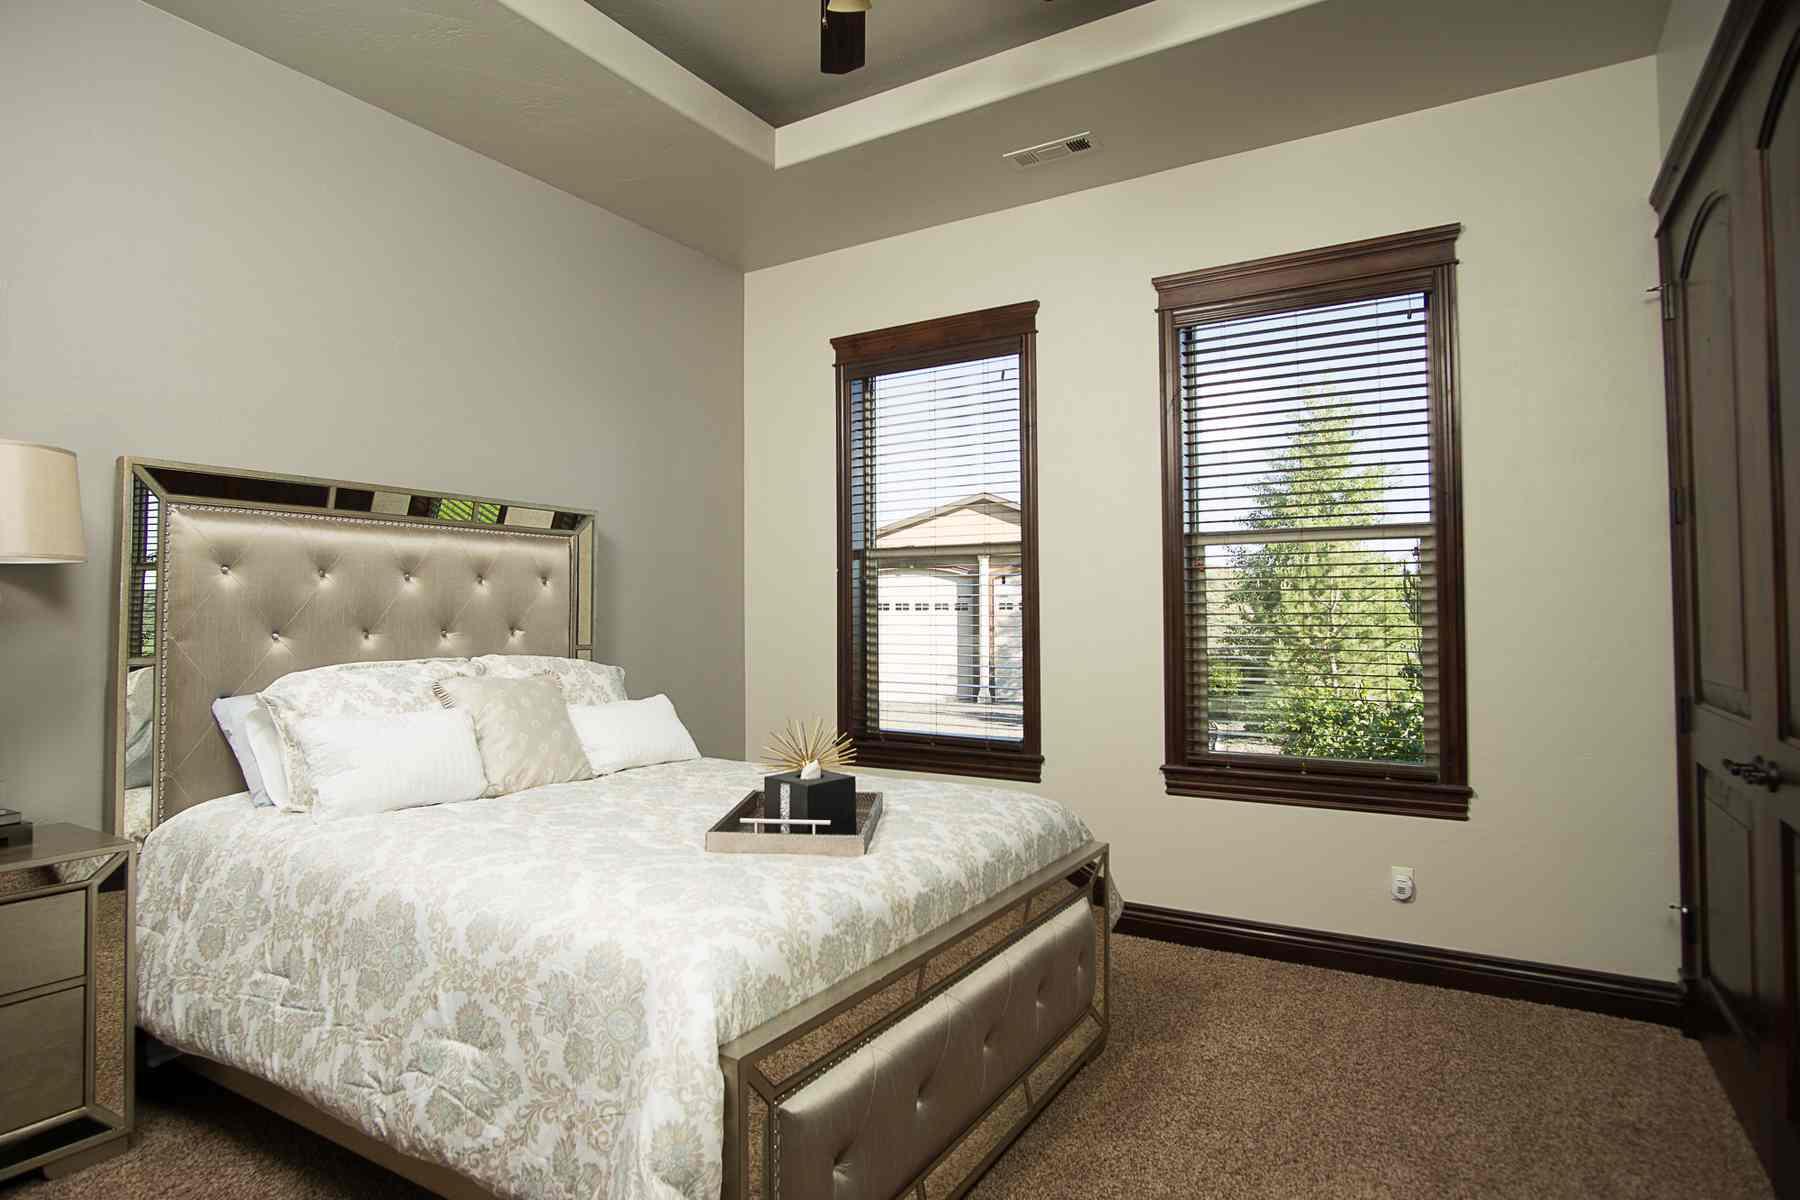 Additional photo for property listing at Stunning 49 Acre Esate 1473 E 4600 N Buhl, Idaho 83316 Estados Unidos